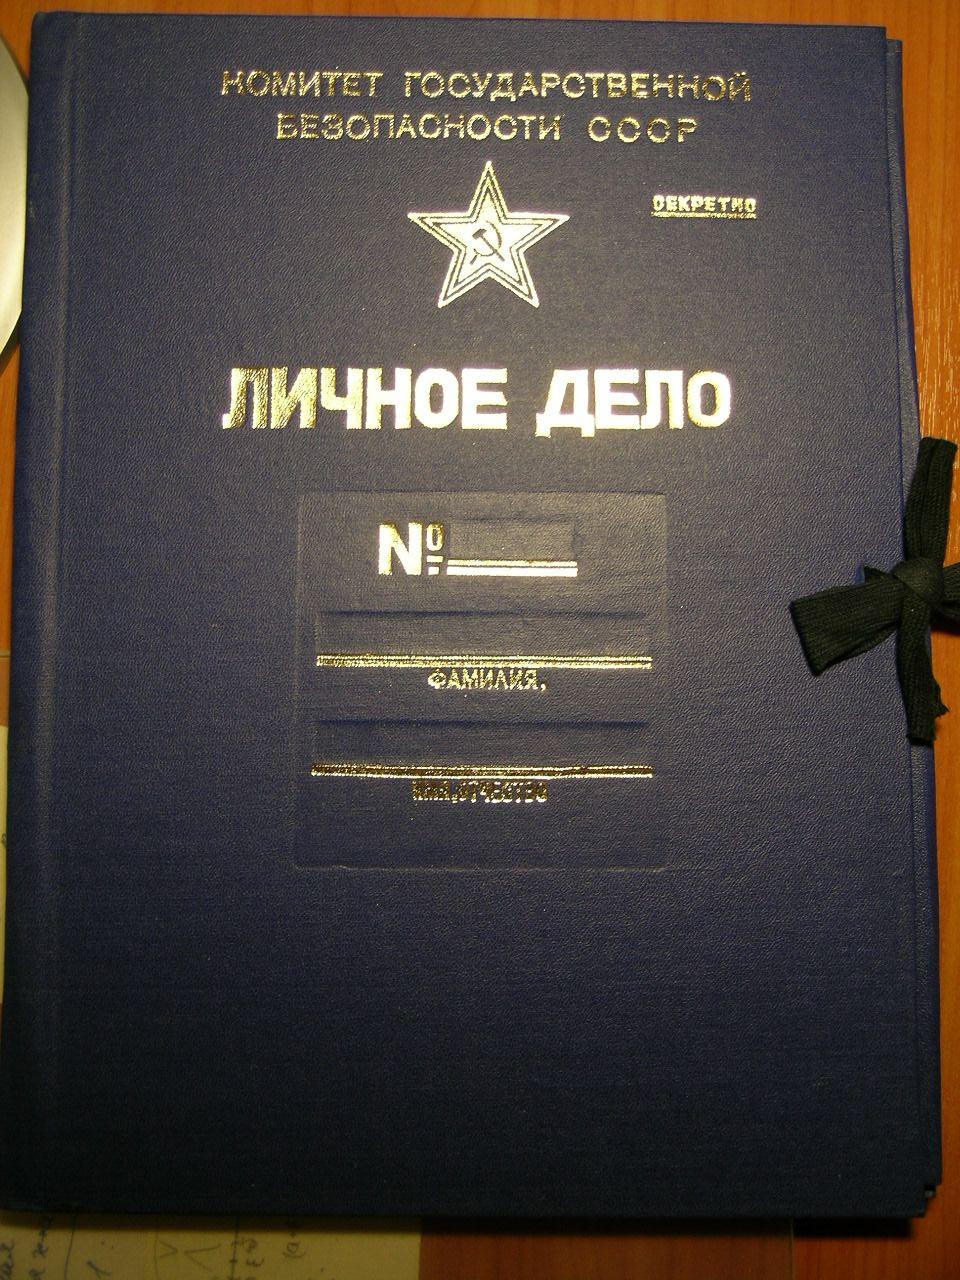 Личное дело, автор: Dmitry Dzhus [nothingpersonal], лицензия: CC BY 2.0